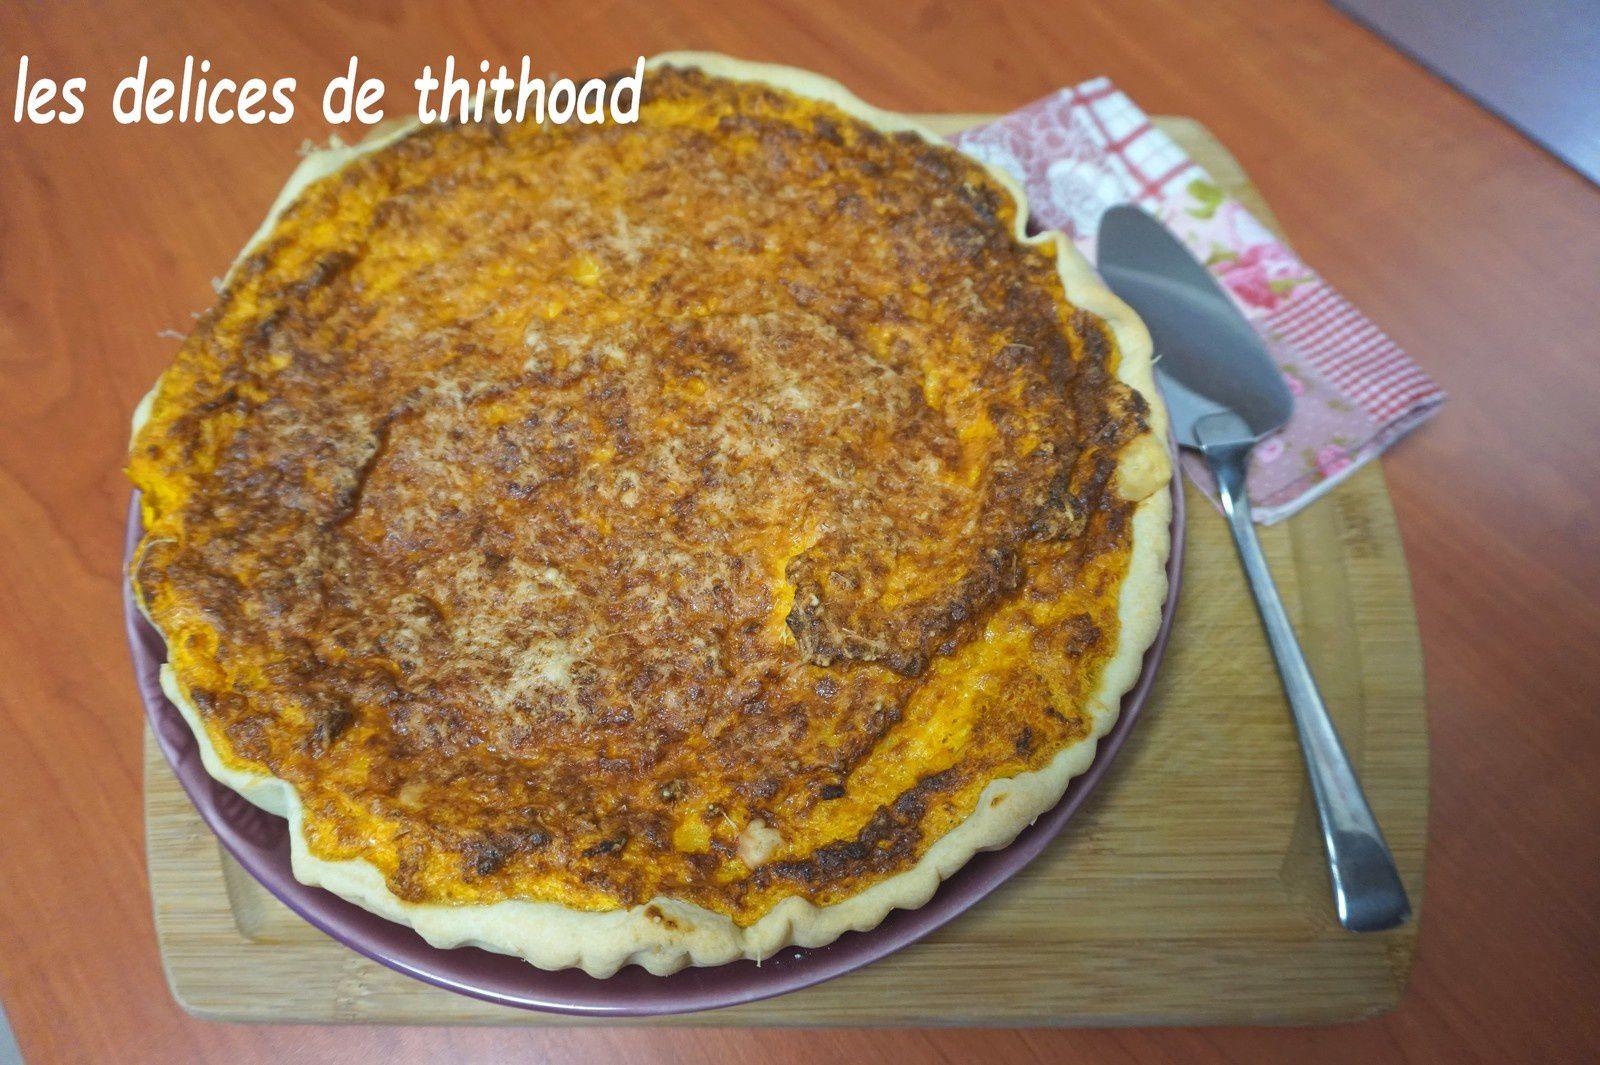 tarte au potimarron (foodista challenge 56)